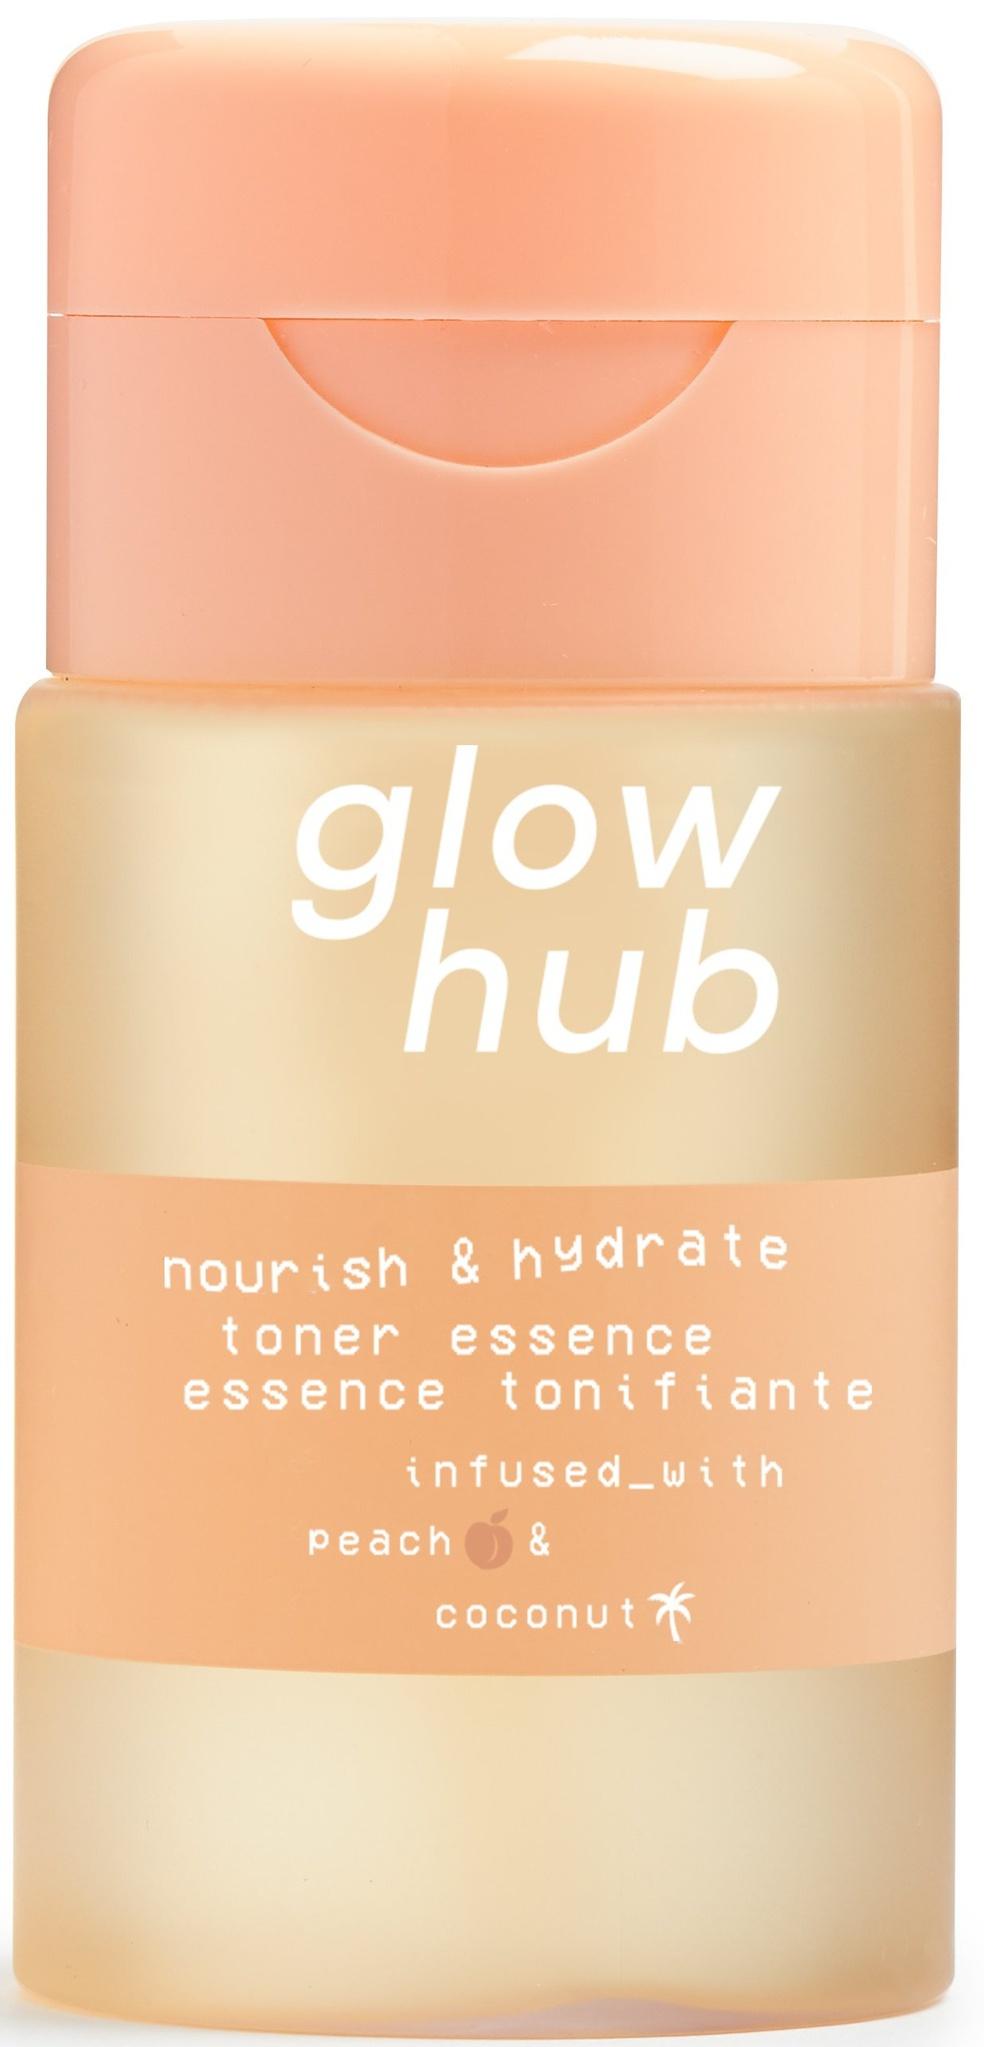 Glow Hub Nourish & Hydrate Toner Essence